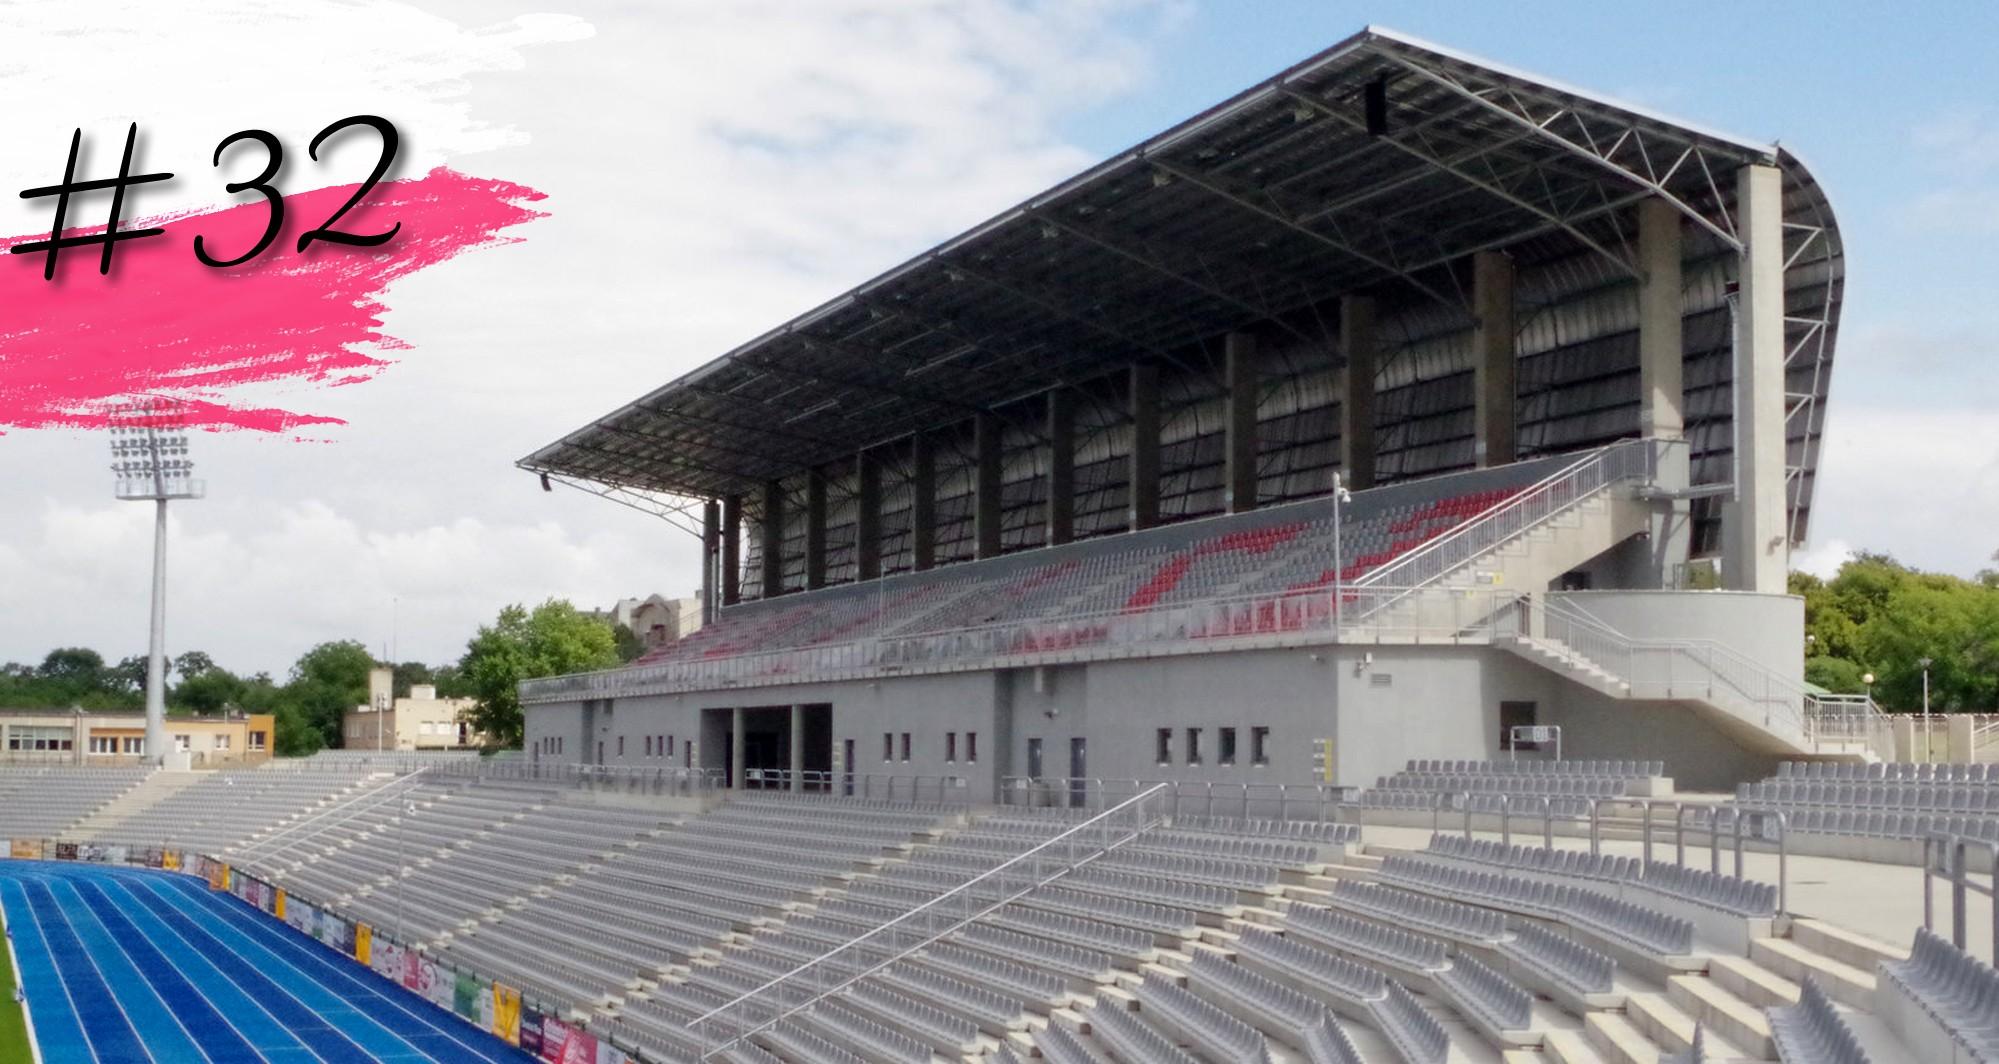 Misja Stadion